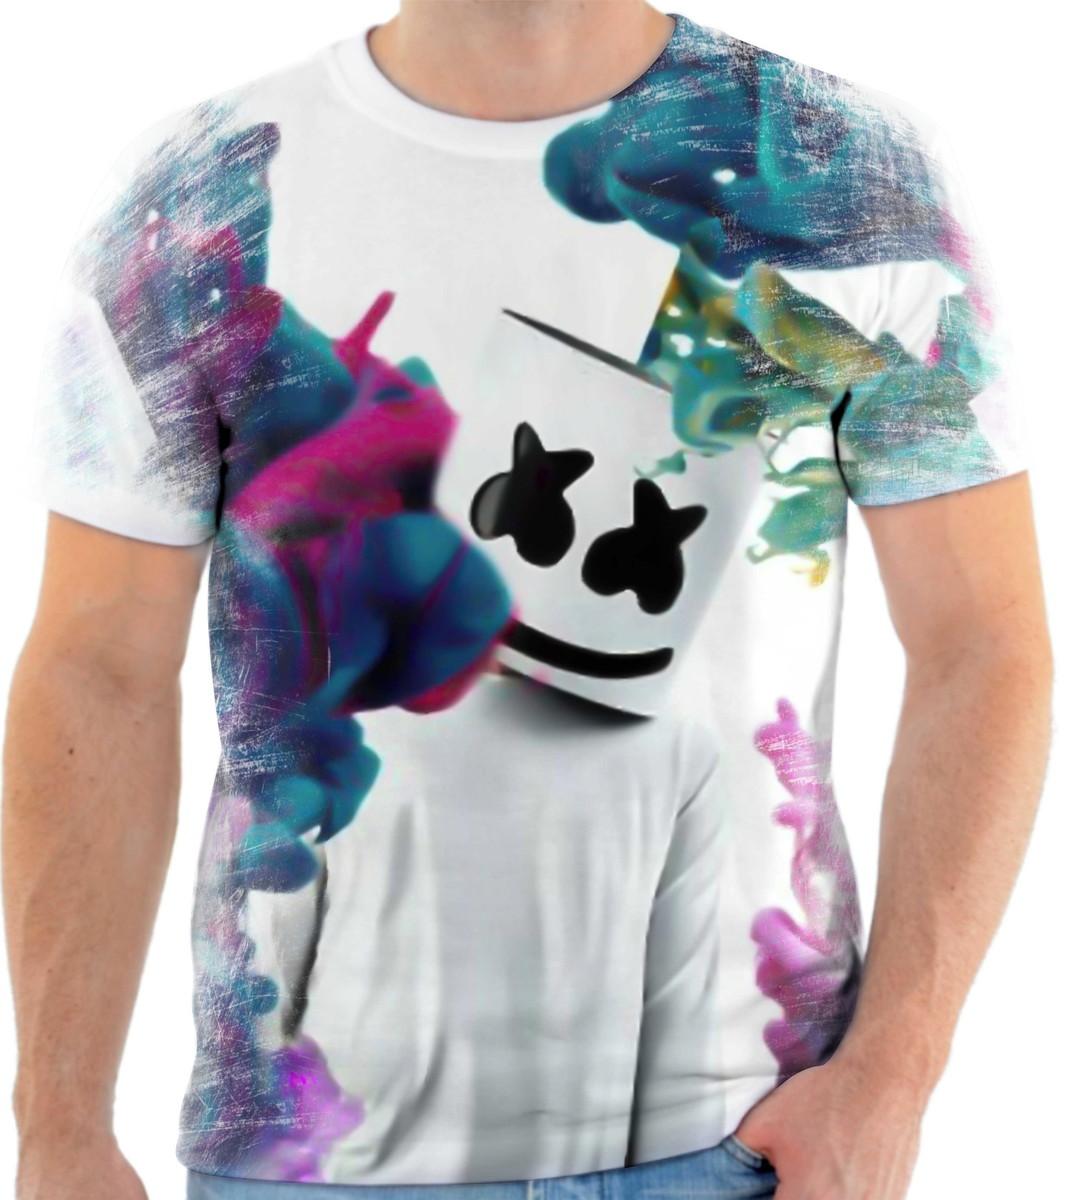 camisa camiseta personalizada produtor marshmello dj 3 no elo7